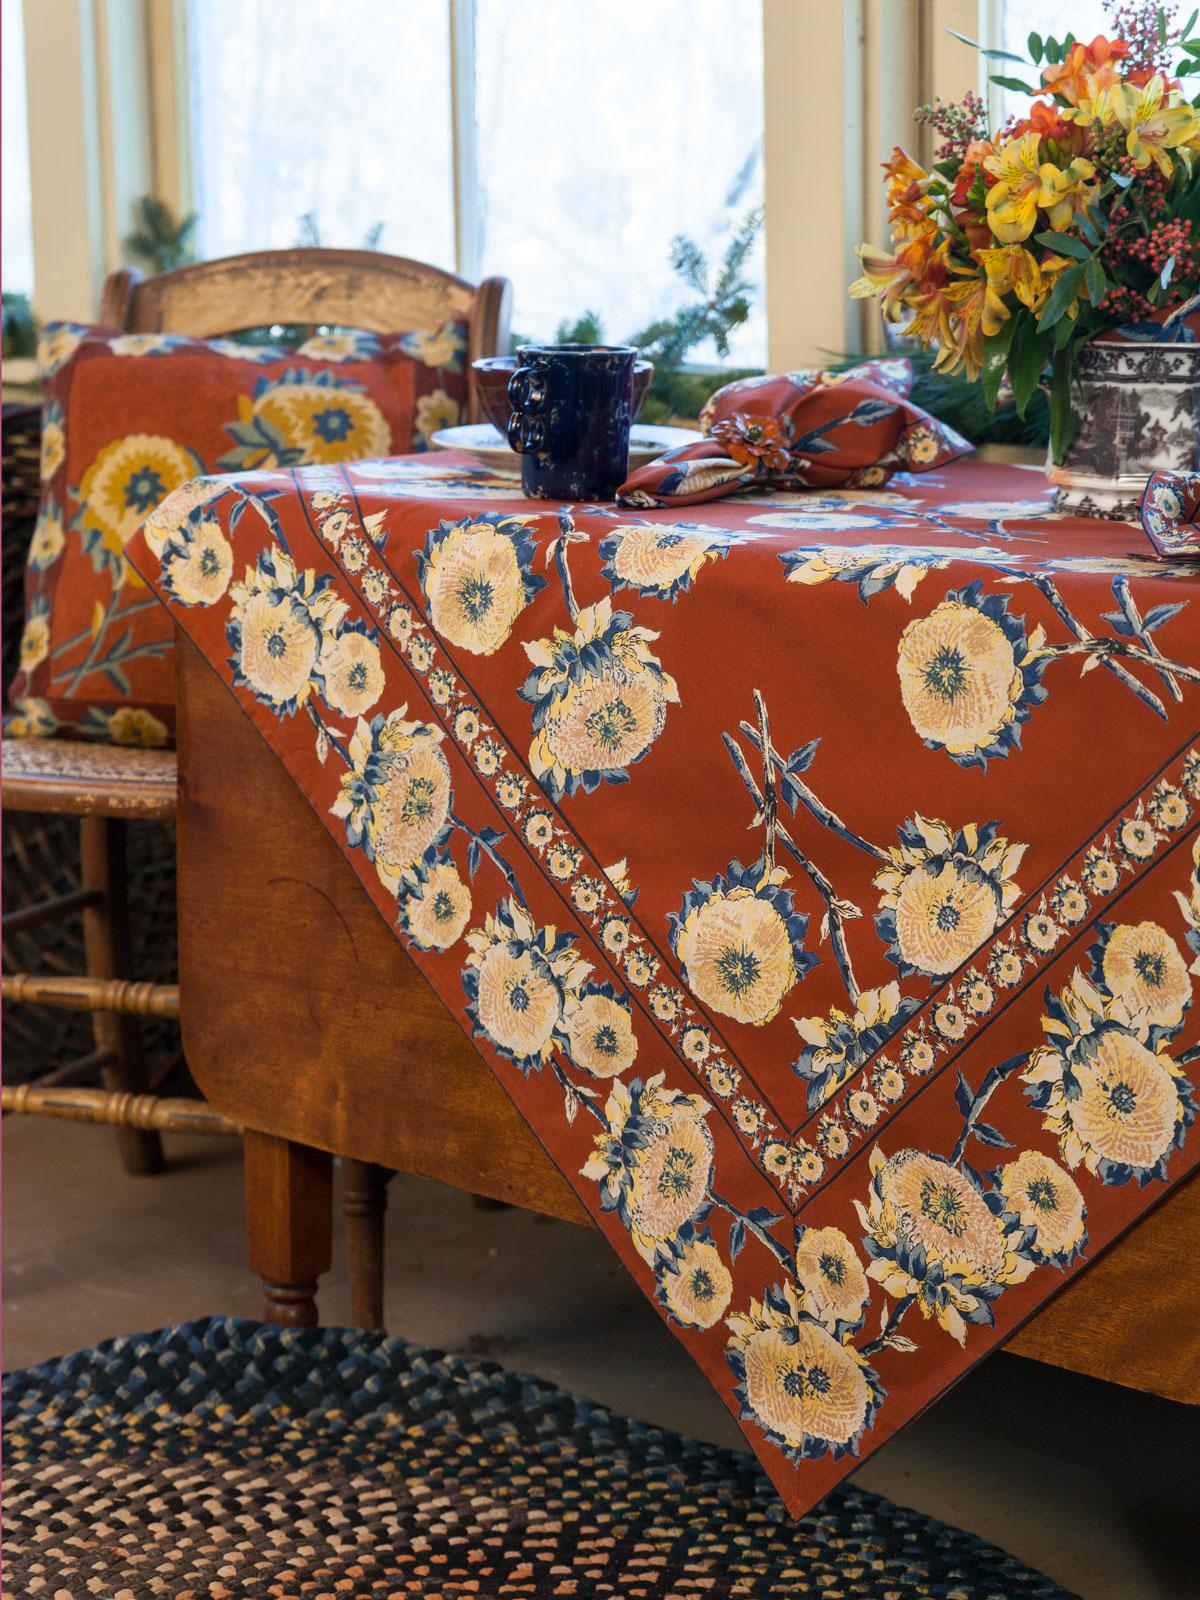 Sun Follower Tablecloth - Rust